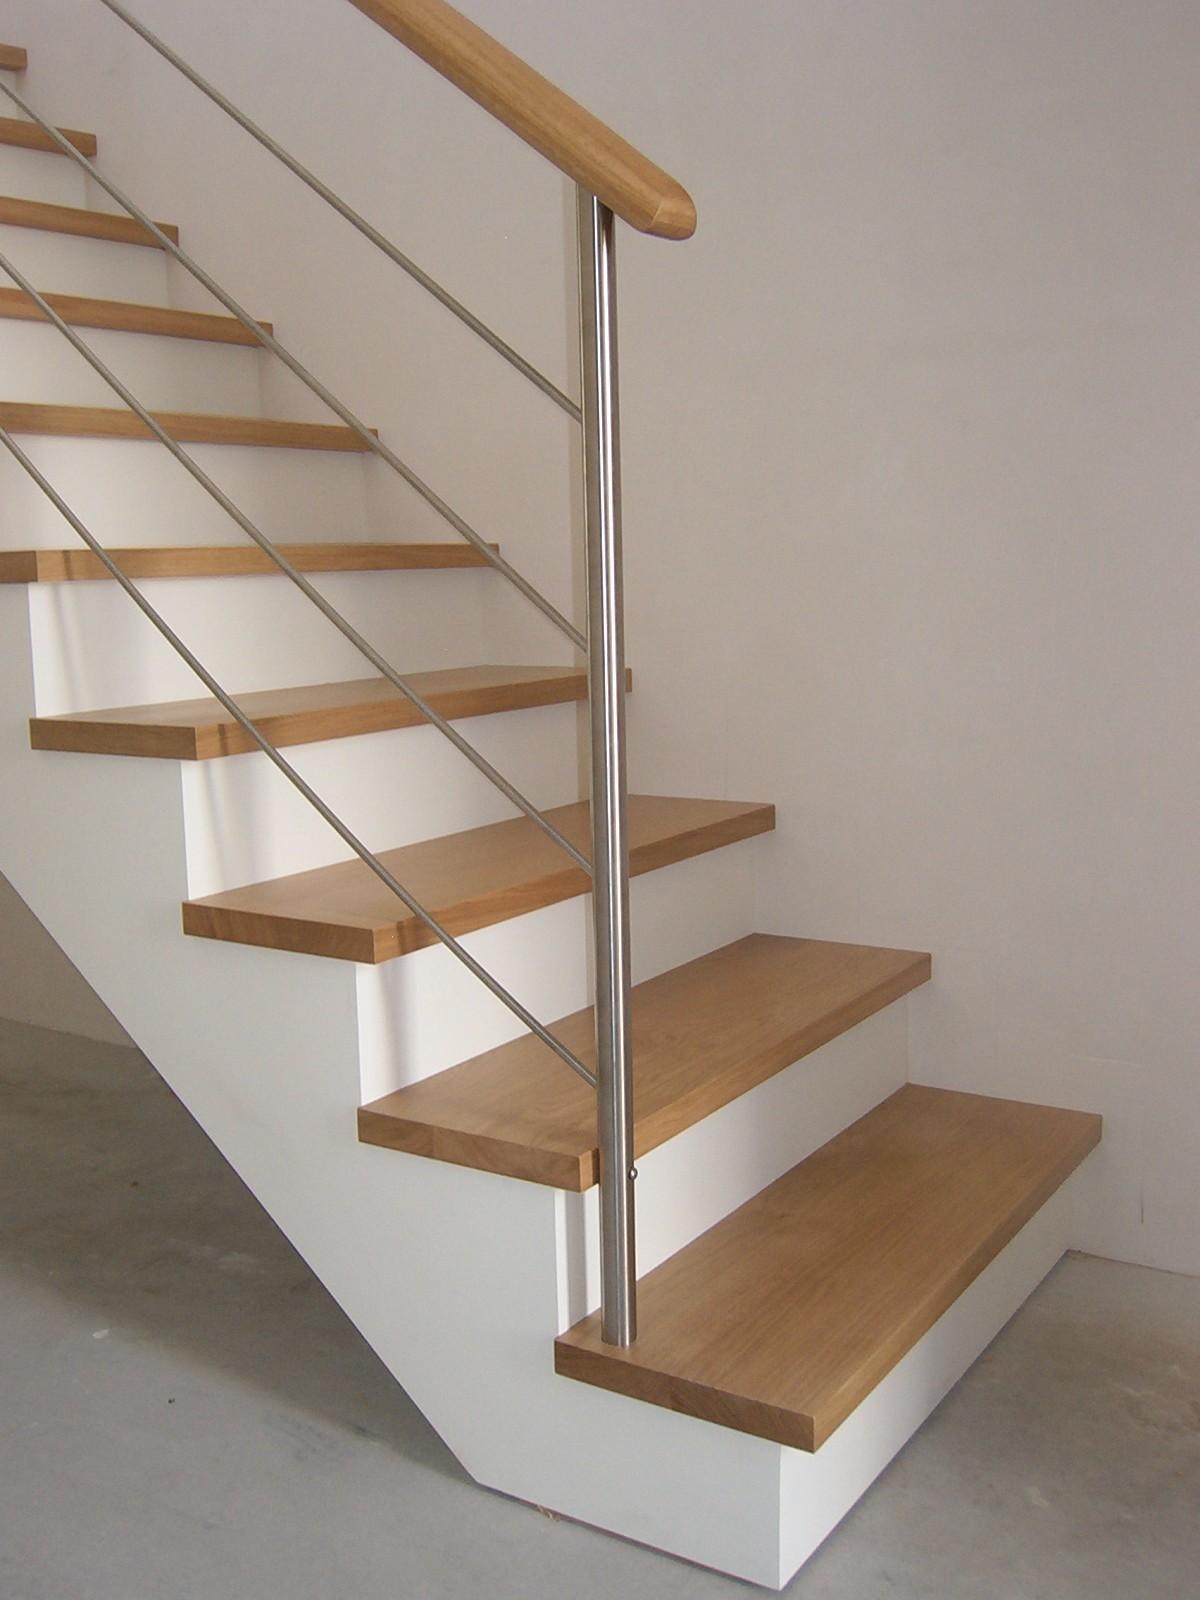 le limon cr maill re atelier glotin pontchateau. Black Bedroom Furniture Sets. Home Design Ideas